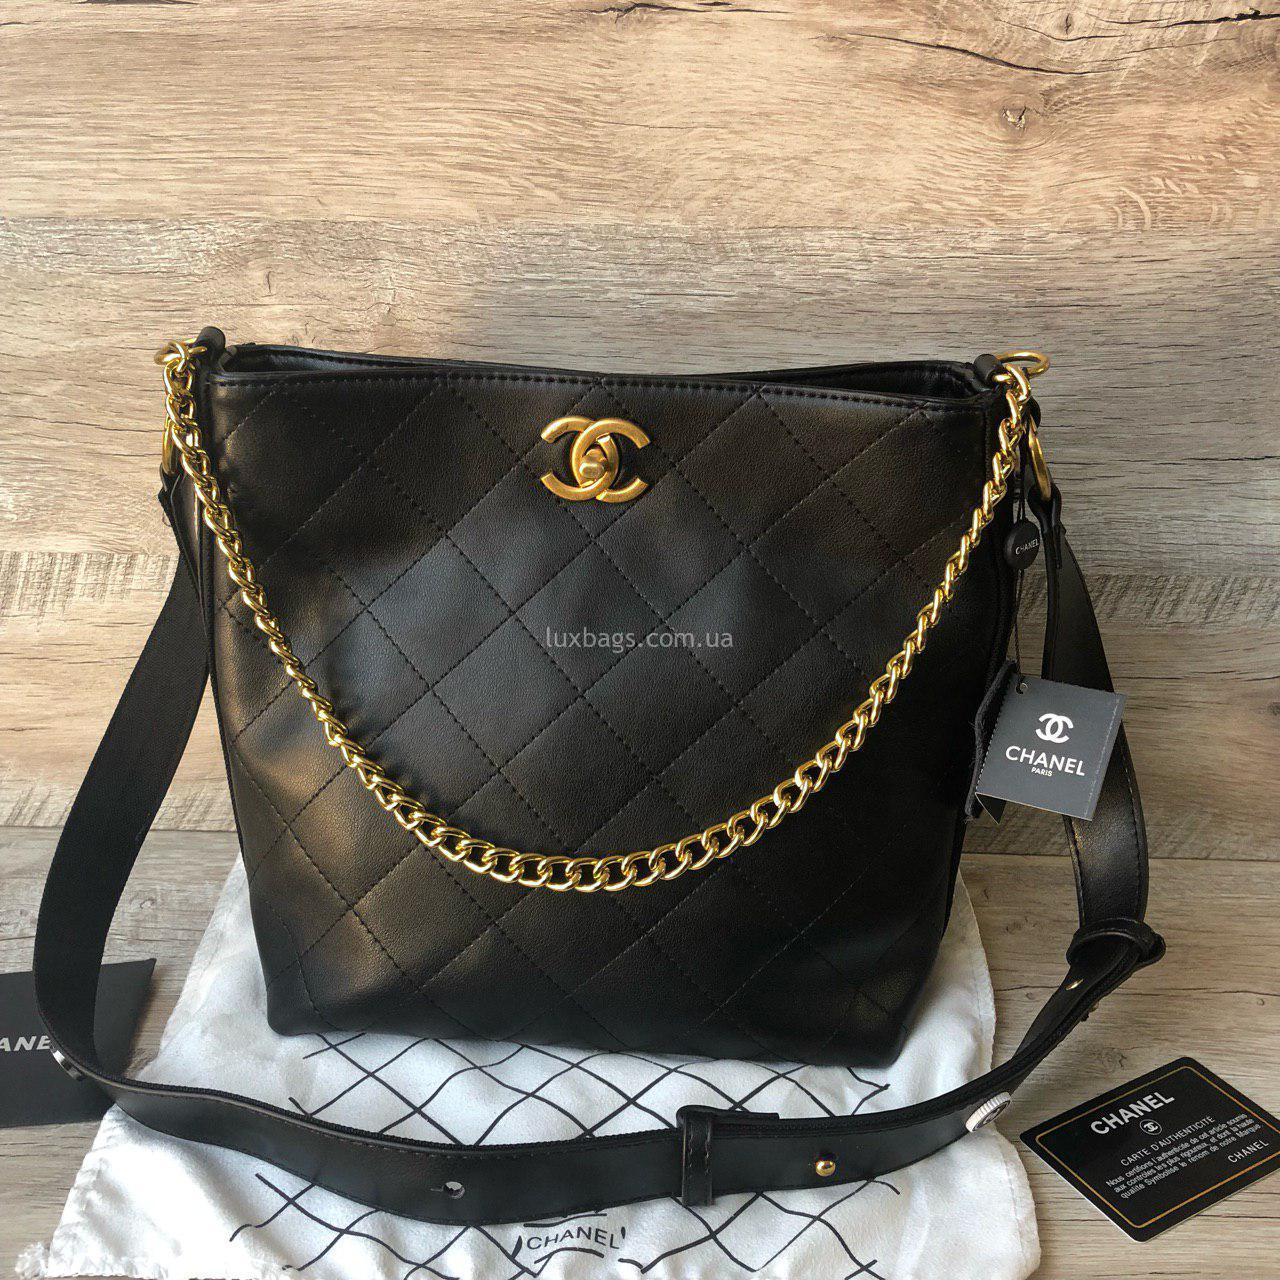 e49a5a7e1514 Сумка из натуральной кожи черная Купить на lux-bags